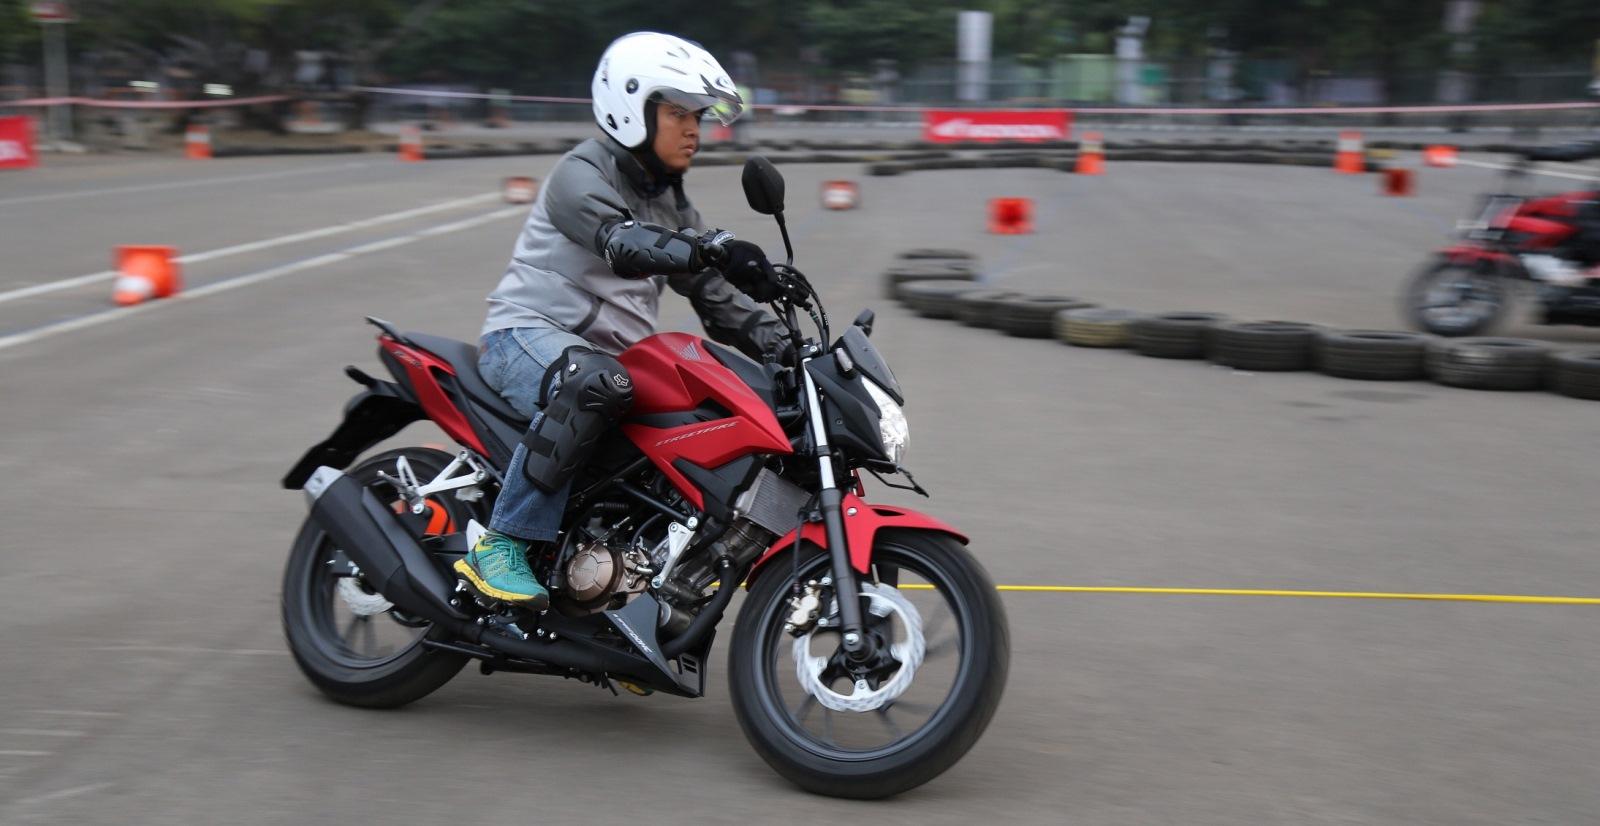 Anisa Counter Sales Dealer Nagamas Motor Klaten All New Cb 150r Streetfire Honda Racing Red Kudus Cb150r Hadir Semakin Gagah